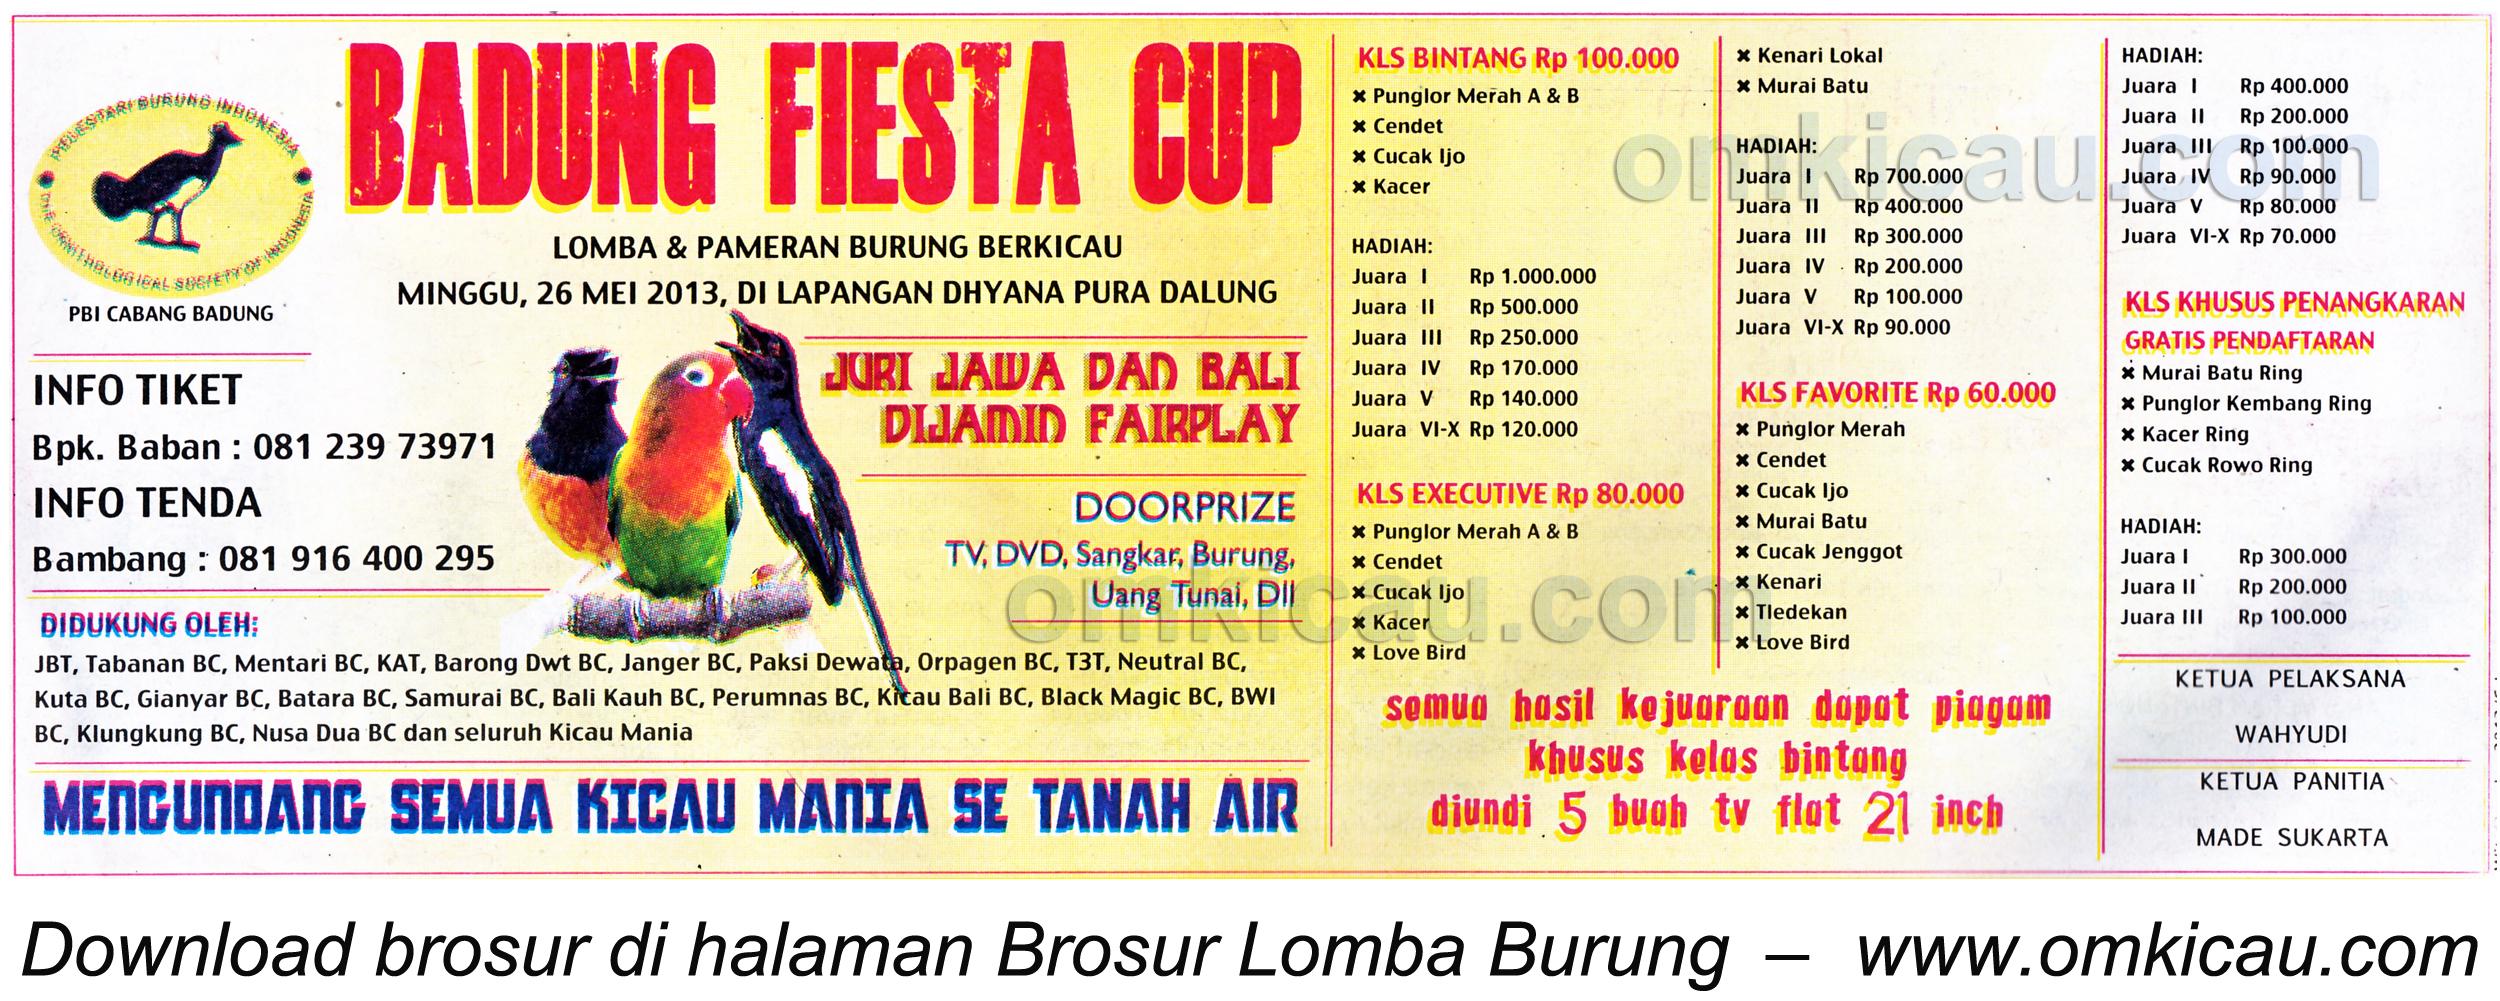 Brosur Lomba Burung Badung Fiesta Cup - 26 Mei 2013